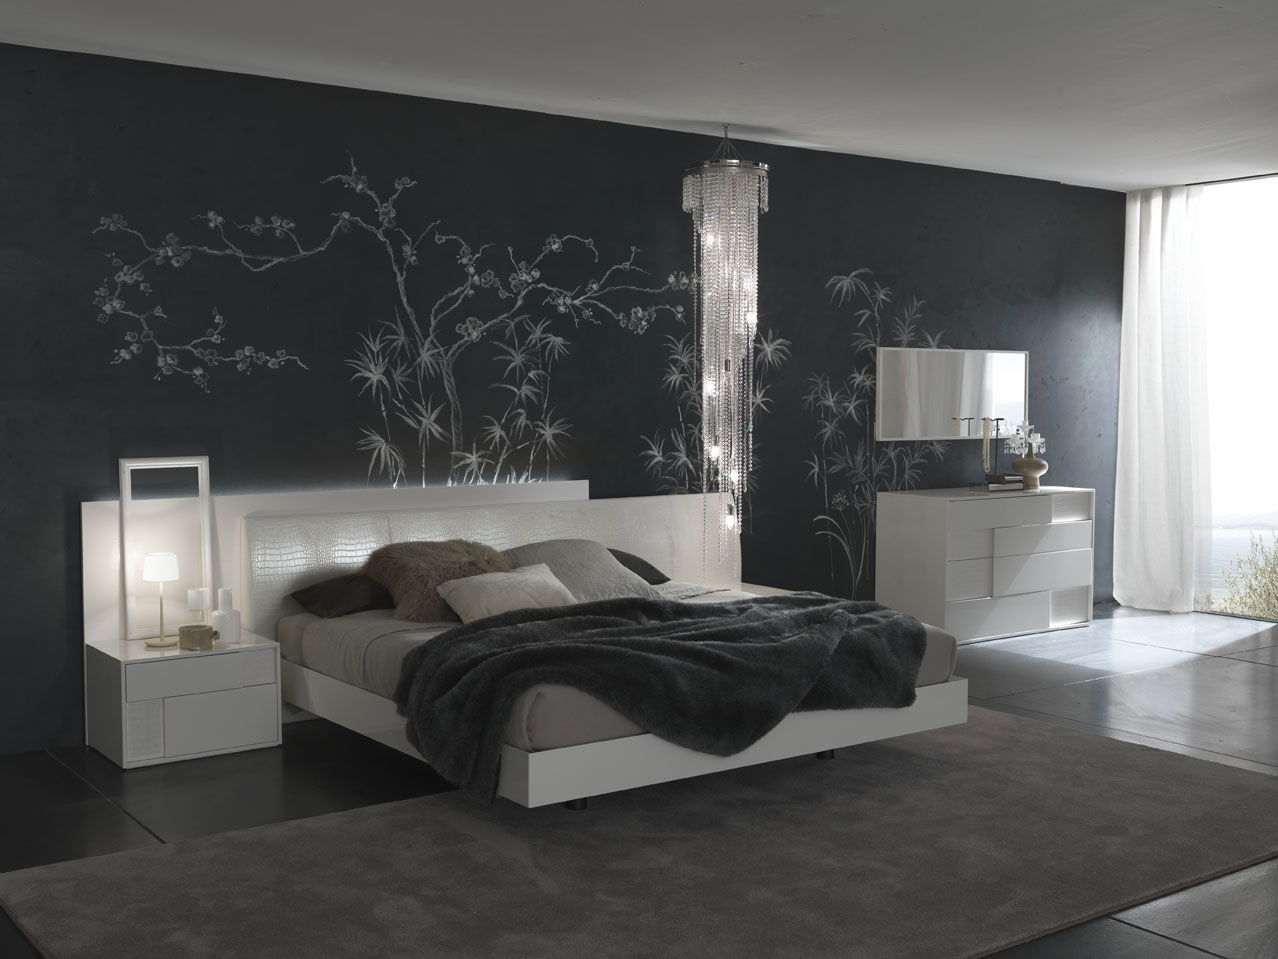 Cool Bedroom Furniture 25 Decoration Idea. Cool Bedroom Furniture 25 Decoration Idea   EnhancedHomes org